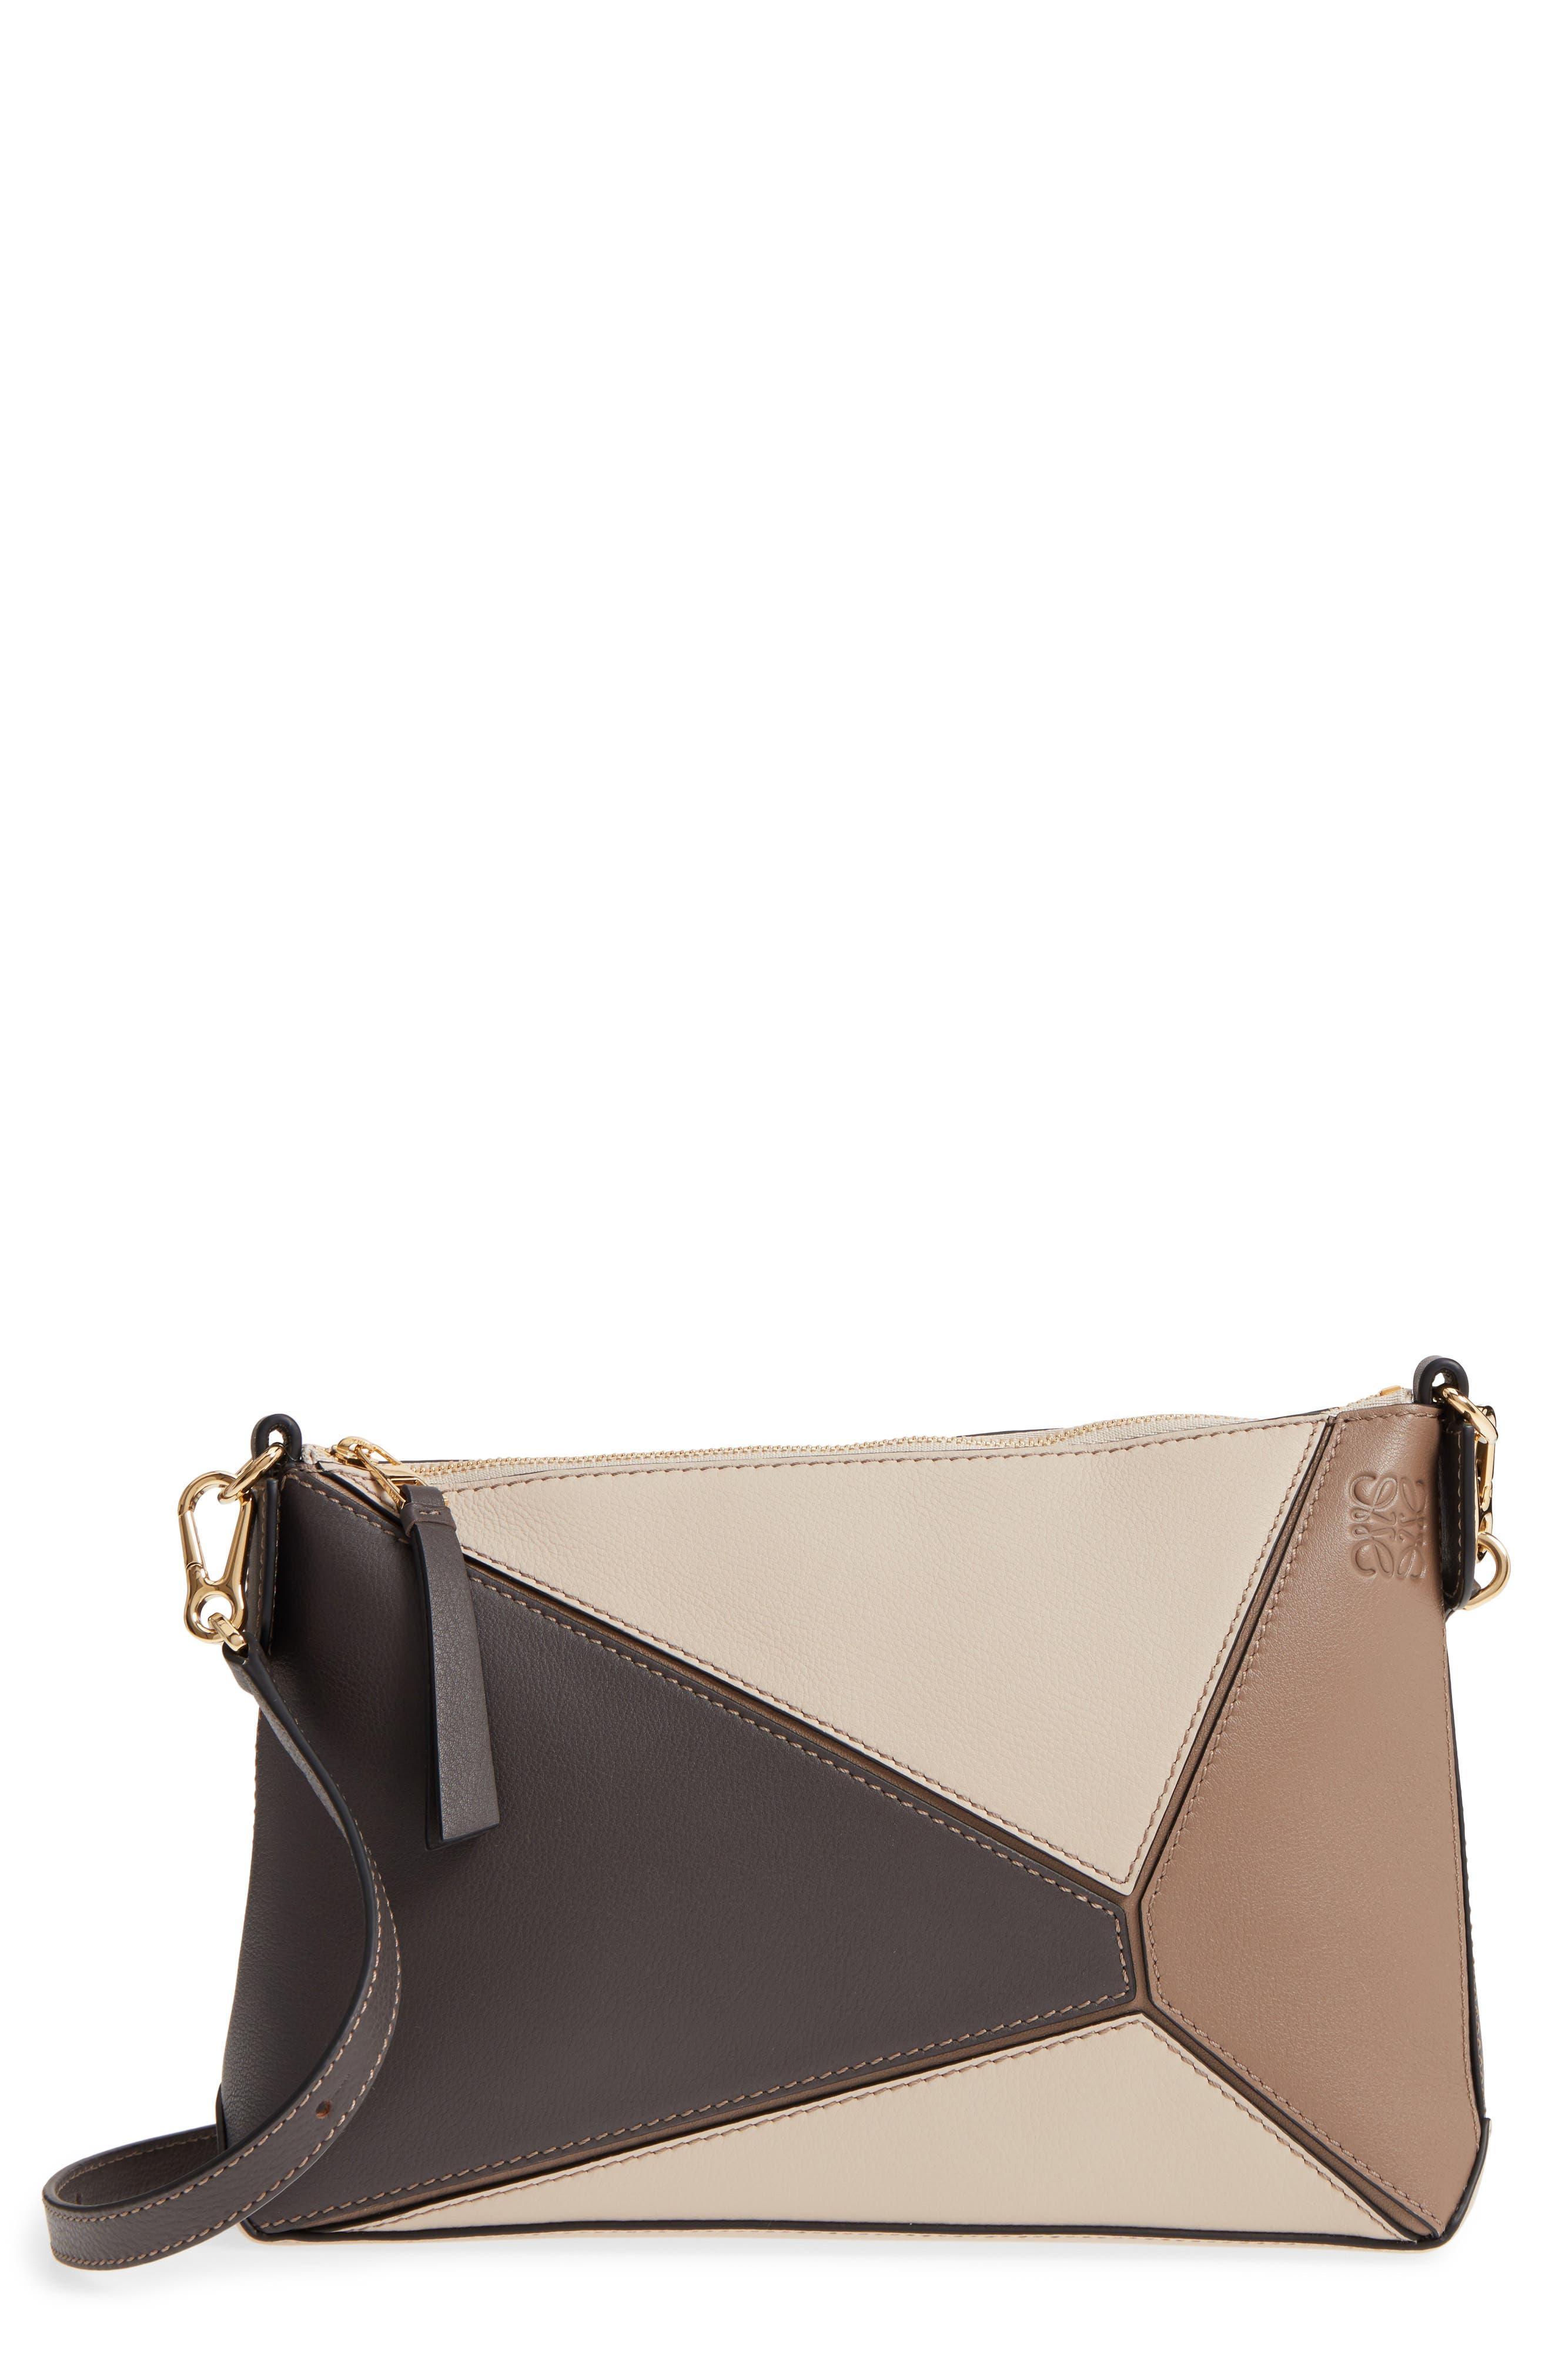 Mini Puzzle Calfskin Leather Crossbody Bag,                             Main thumbnail 1, color,                             DARK TAUPE MULTITONE